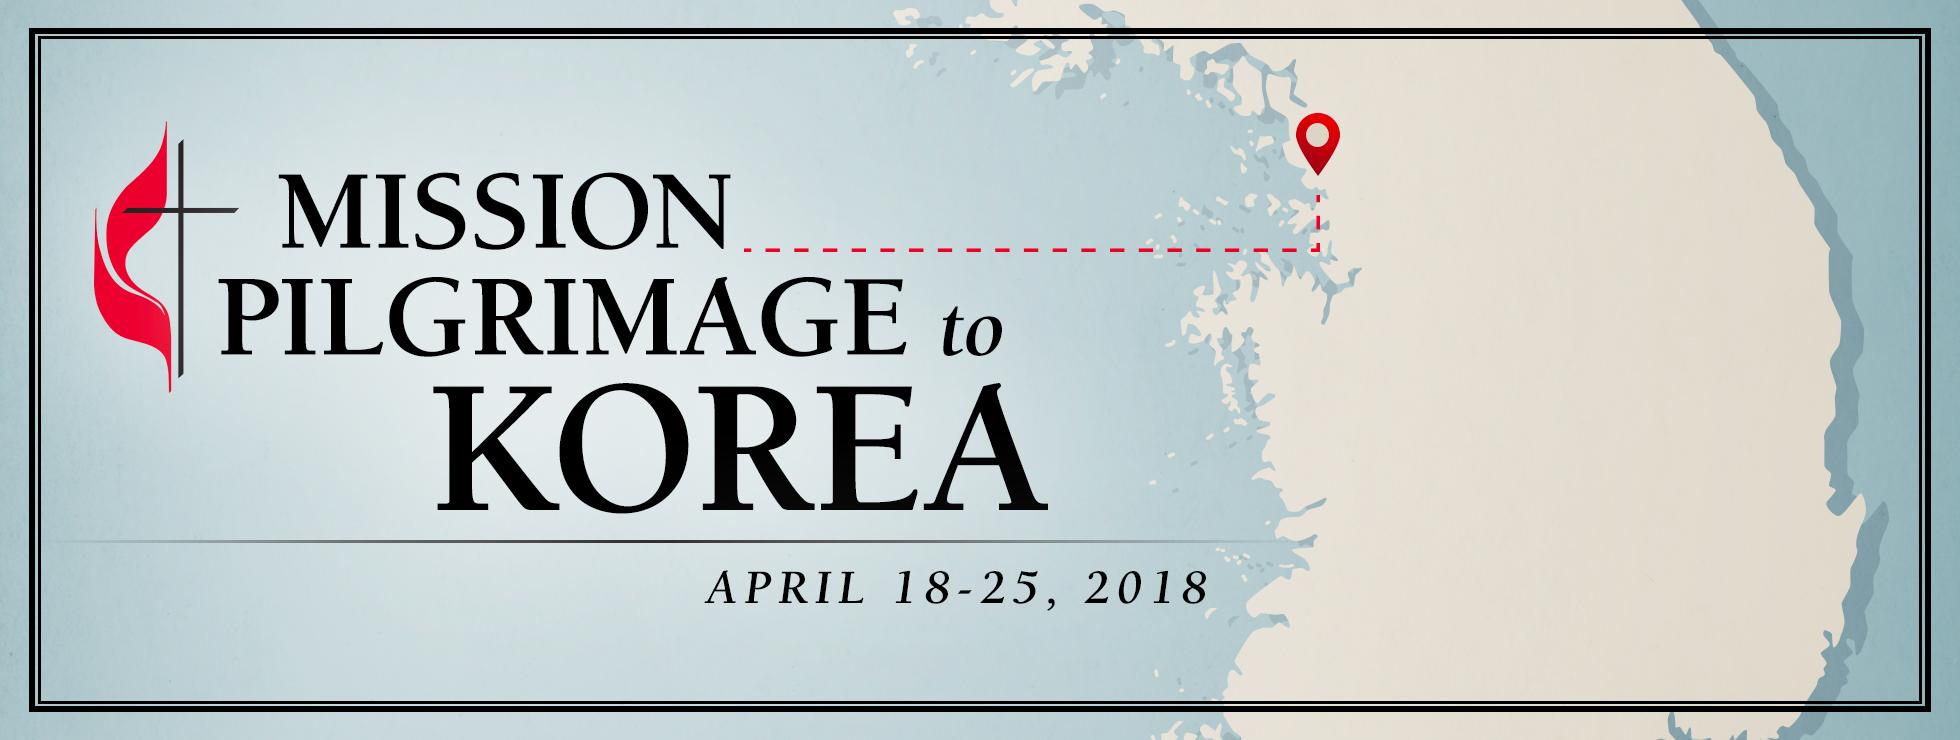 Mission Pilgrimage to Korea